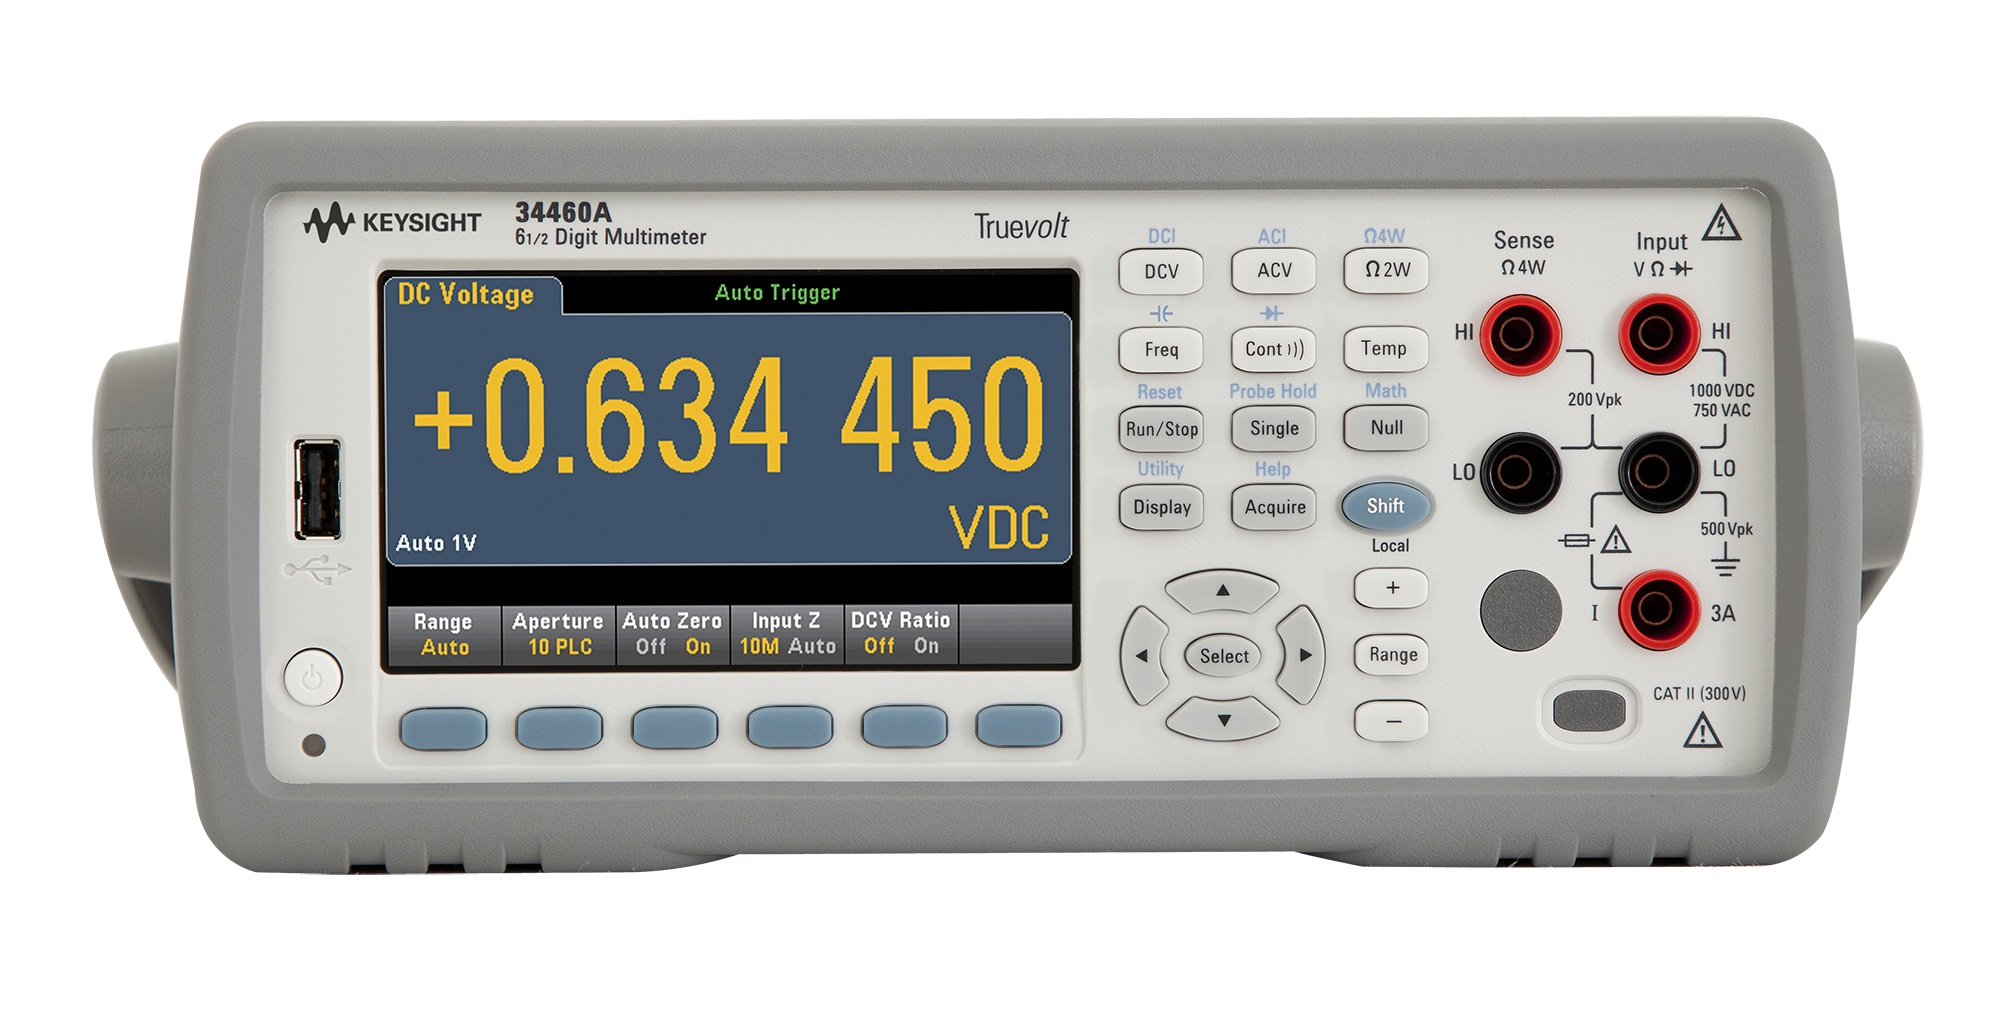 34460A Dijital Multimetre, 6½ Dijit, Basic Truevolt DMM